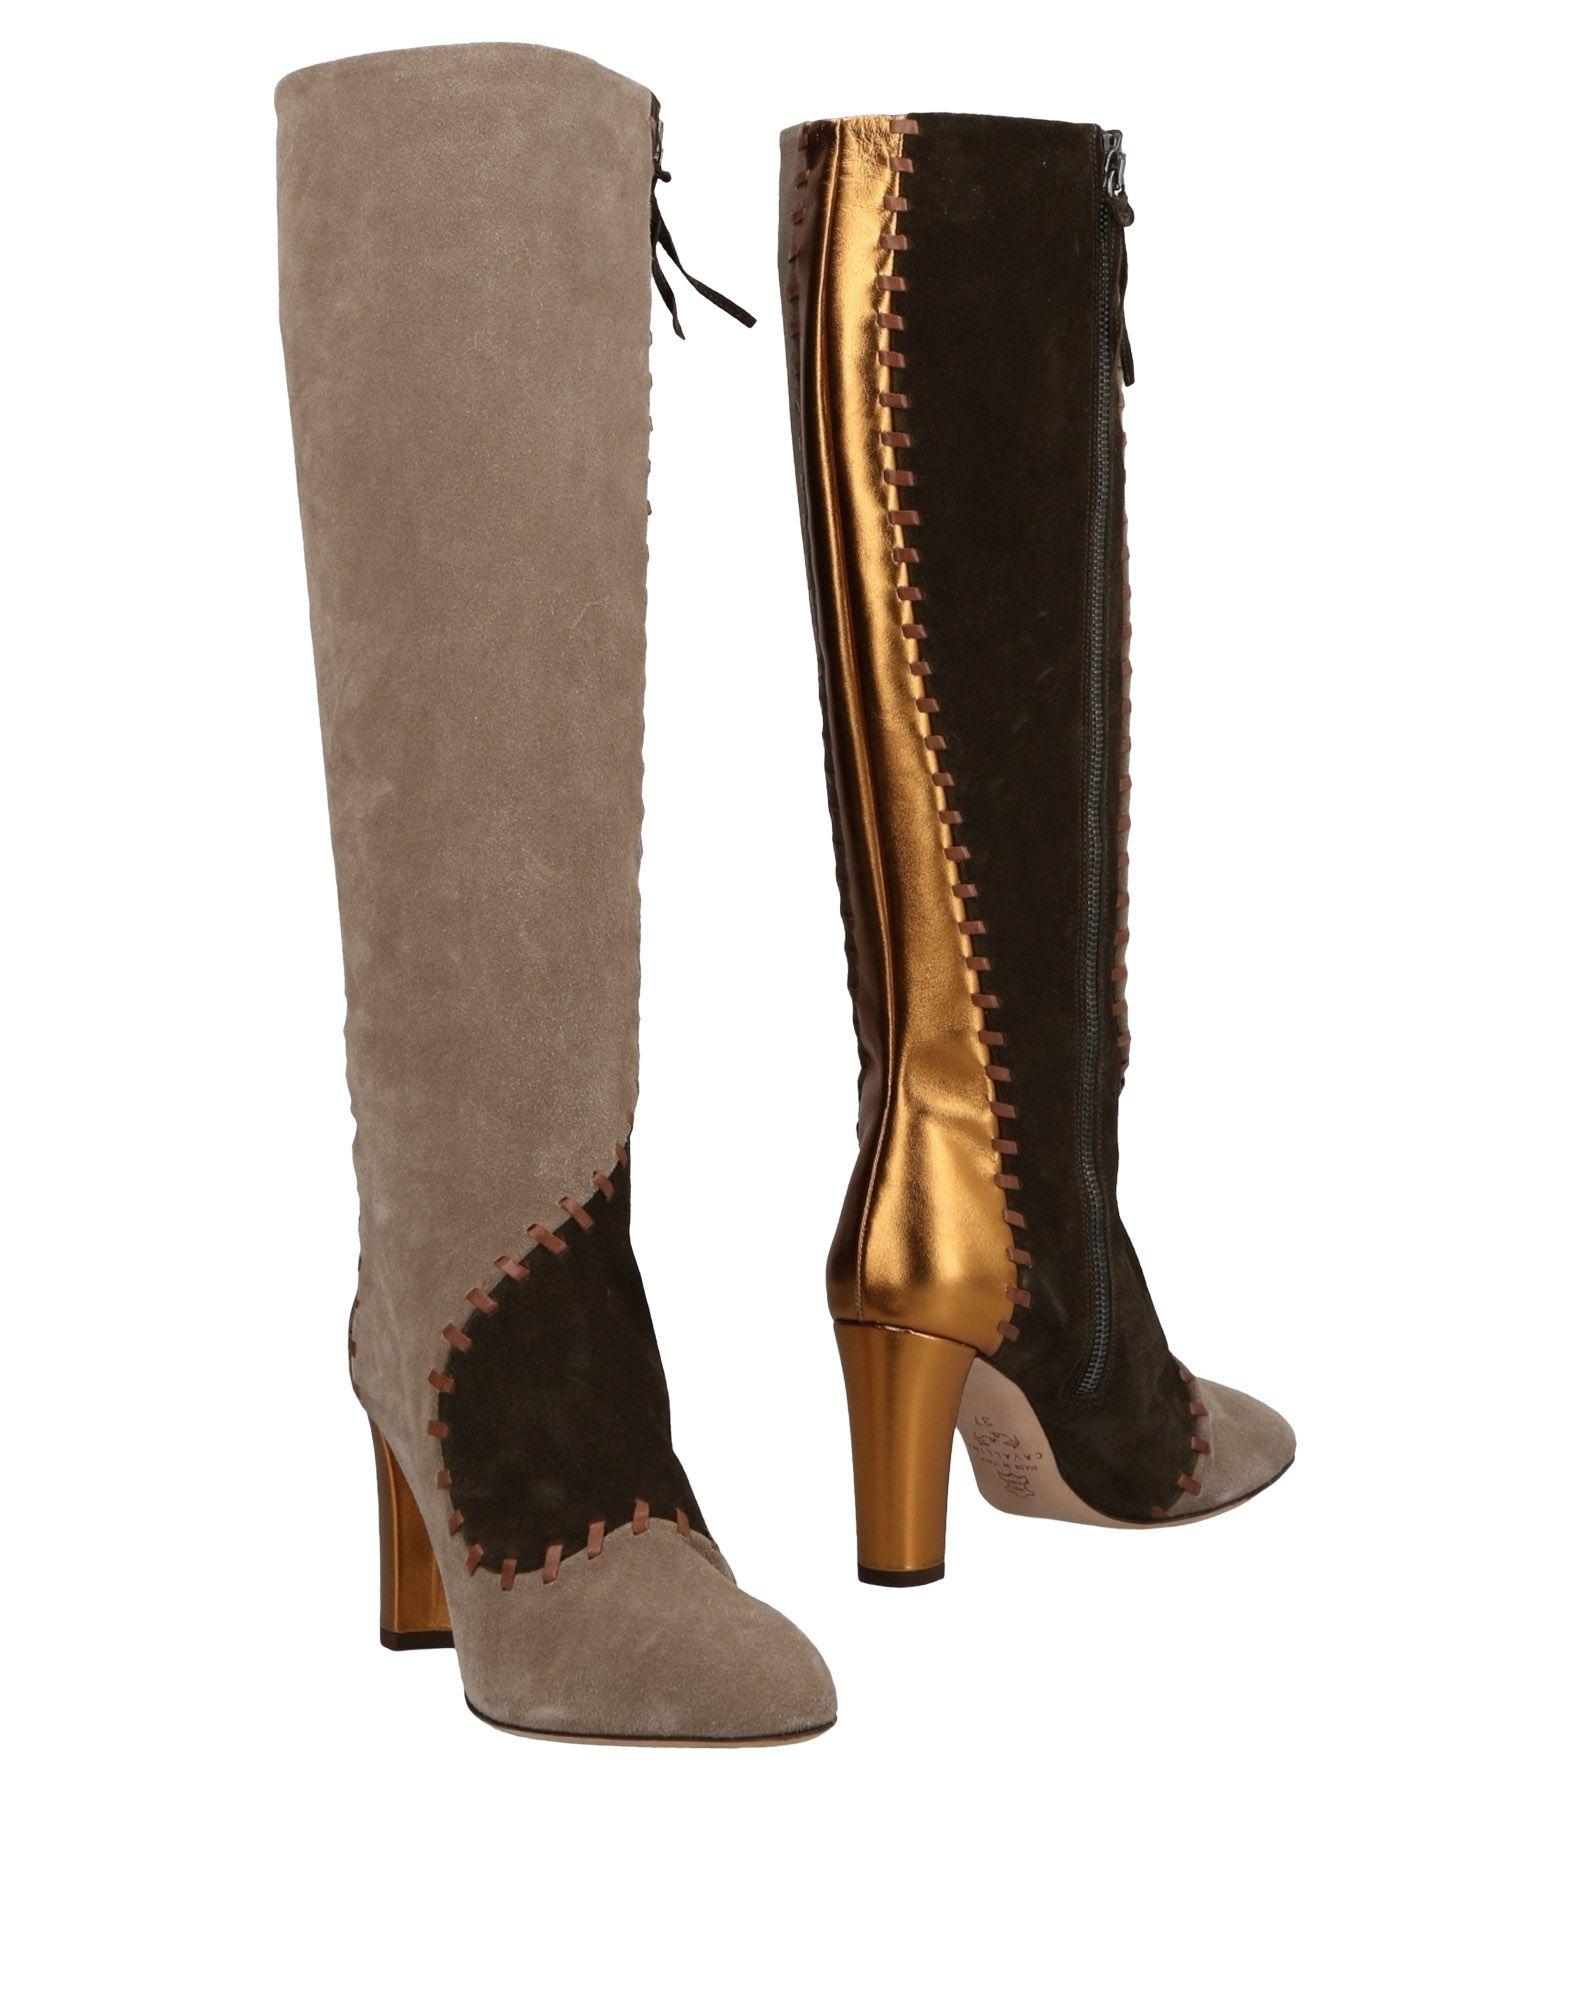 Moda Stivali Cavallini Donna 11484150QQ - 11484150QQ Donna a5fc31